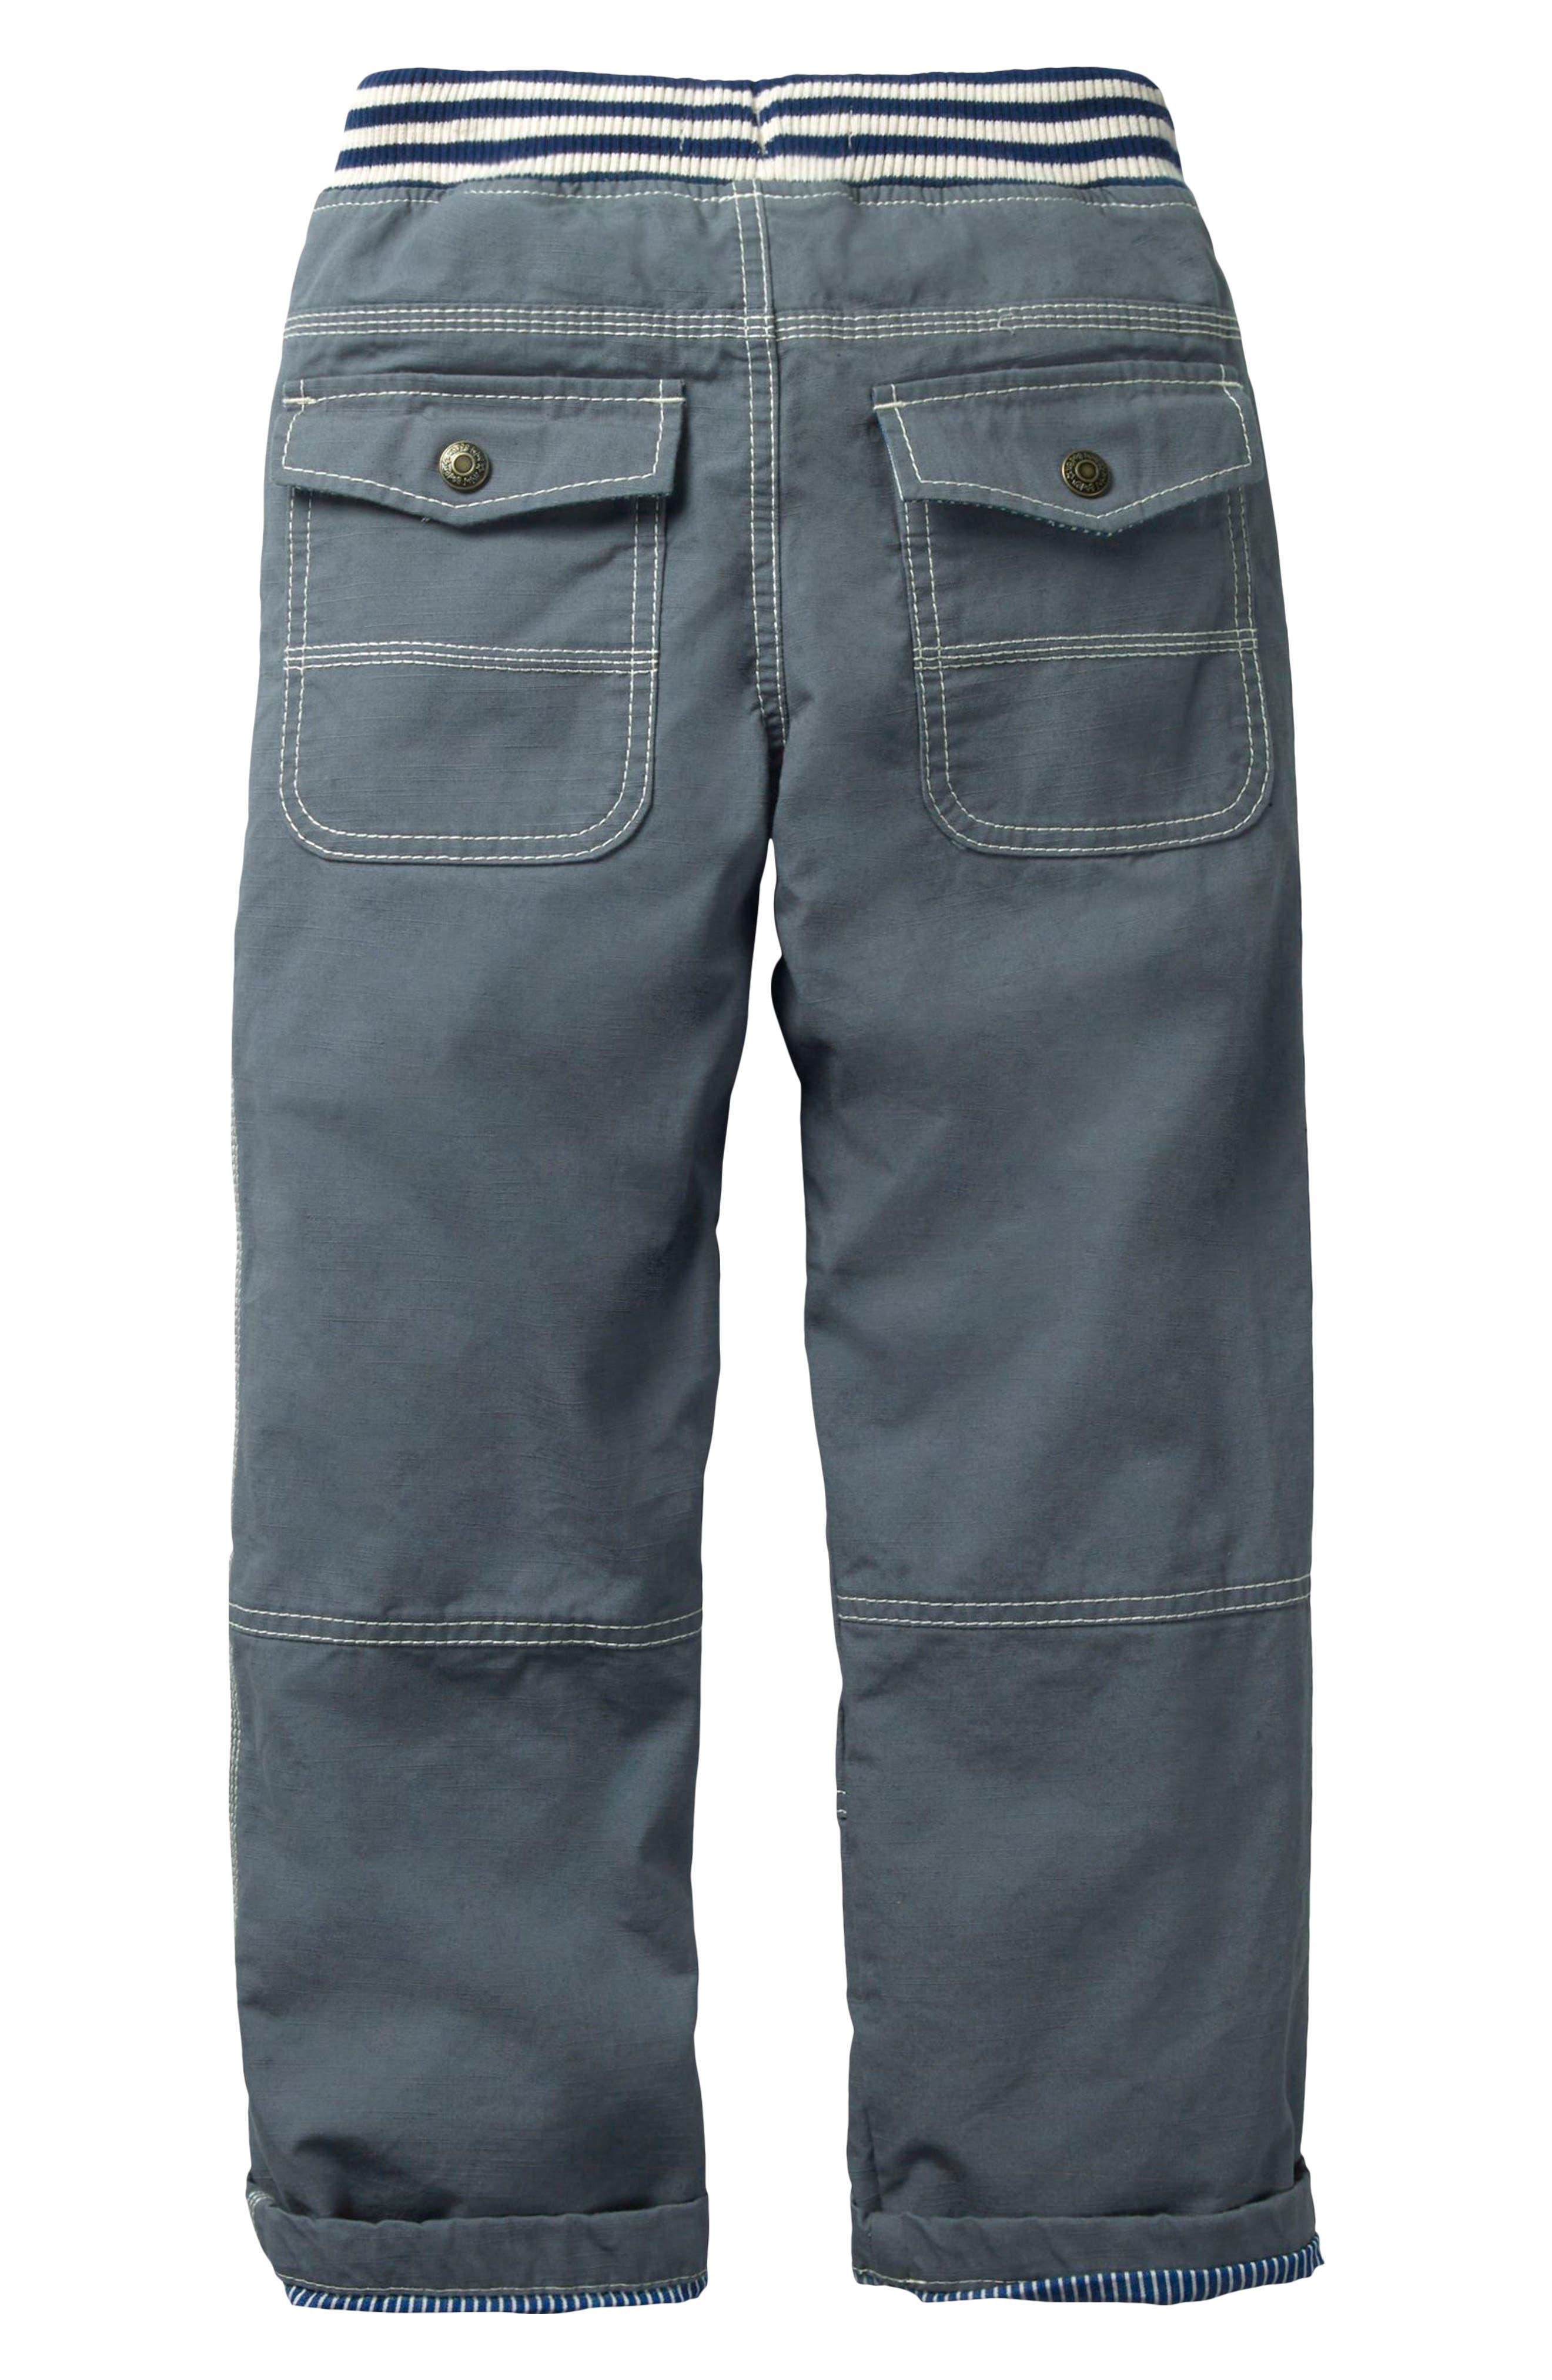 Lined Mariner Pants,                             Alternate thumbnail 2, color,                             Cobble Grey